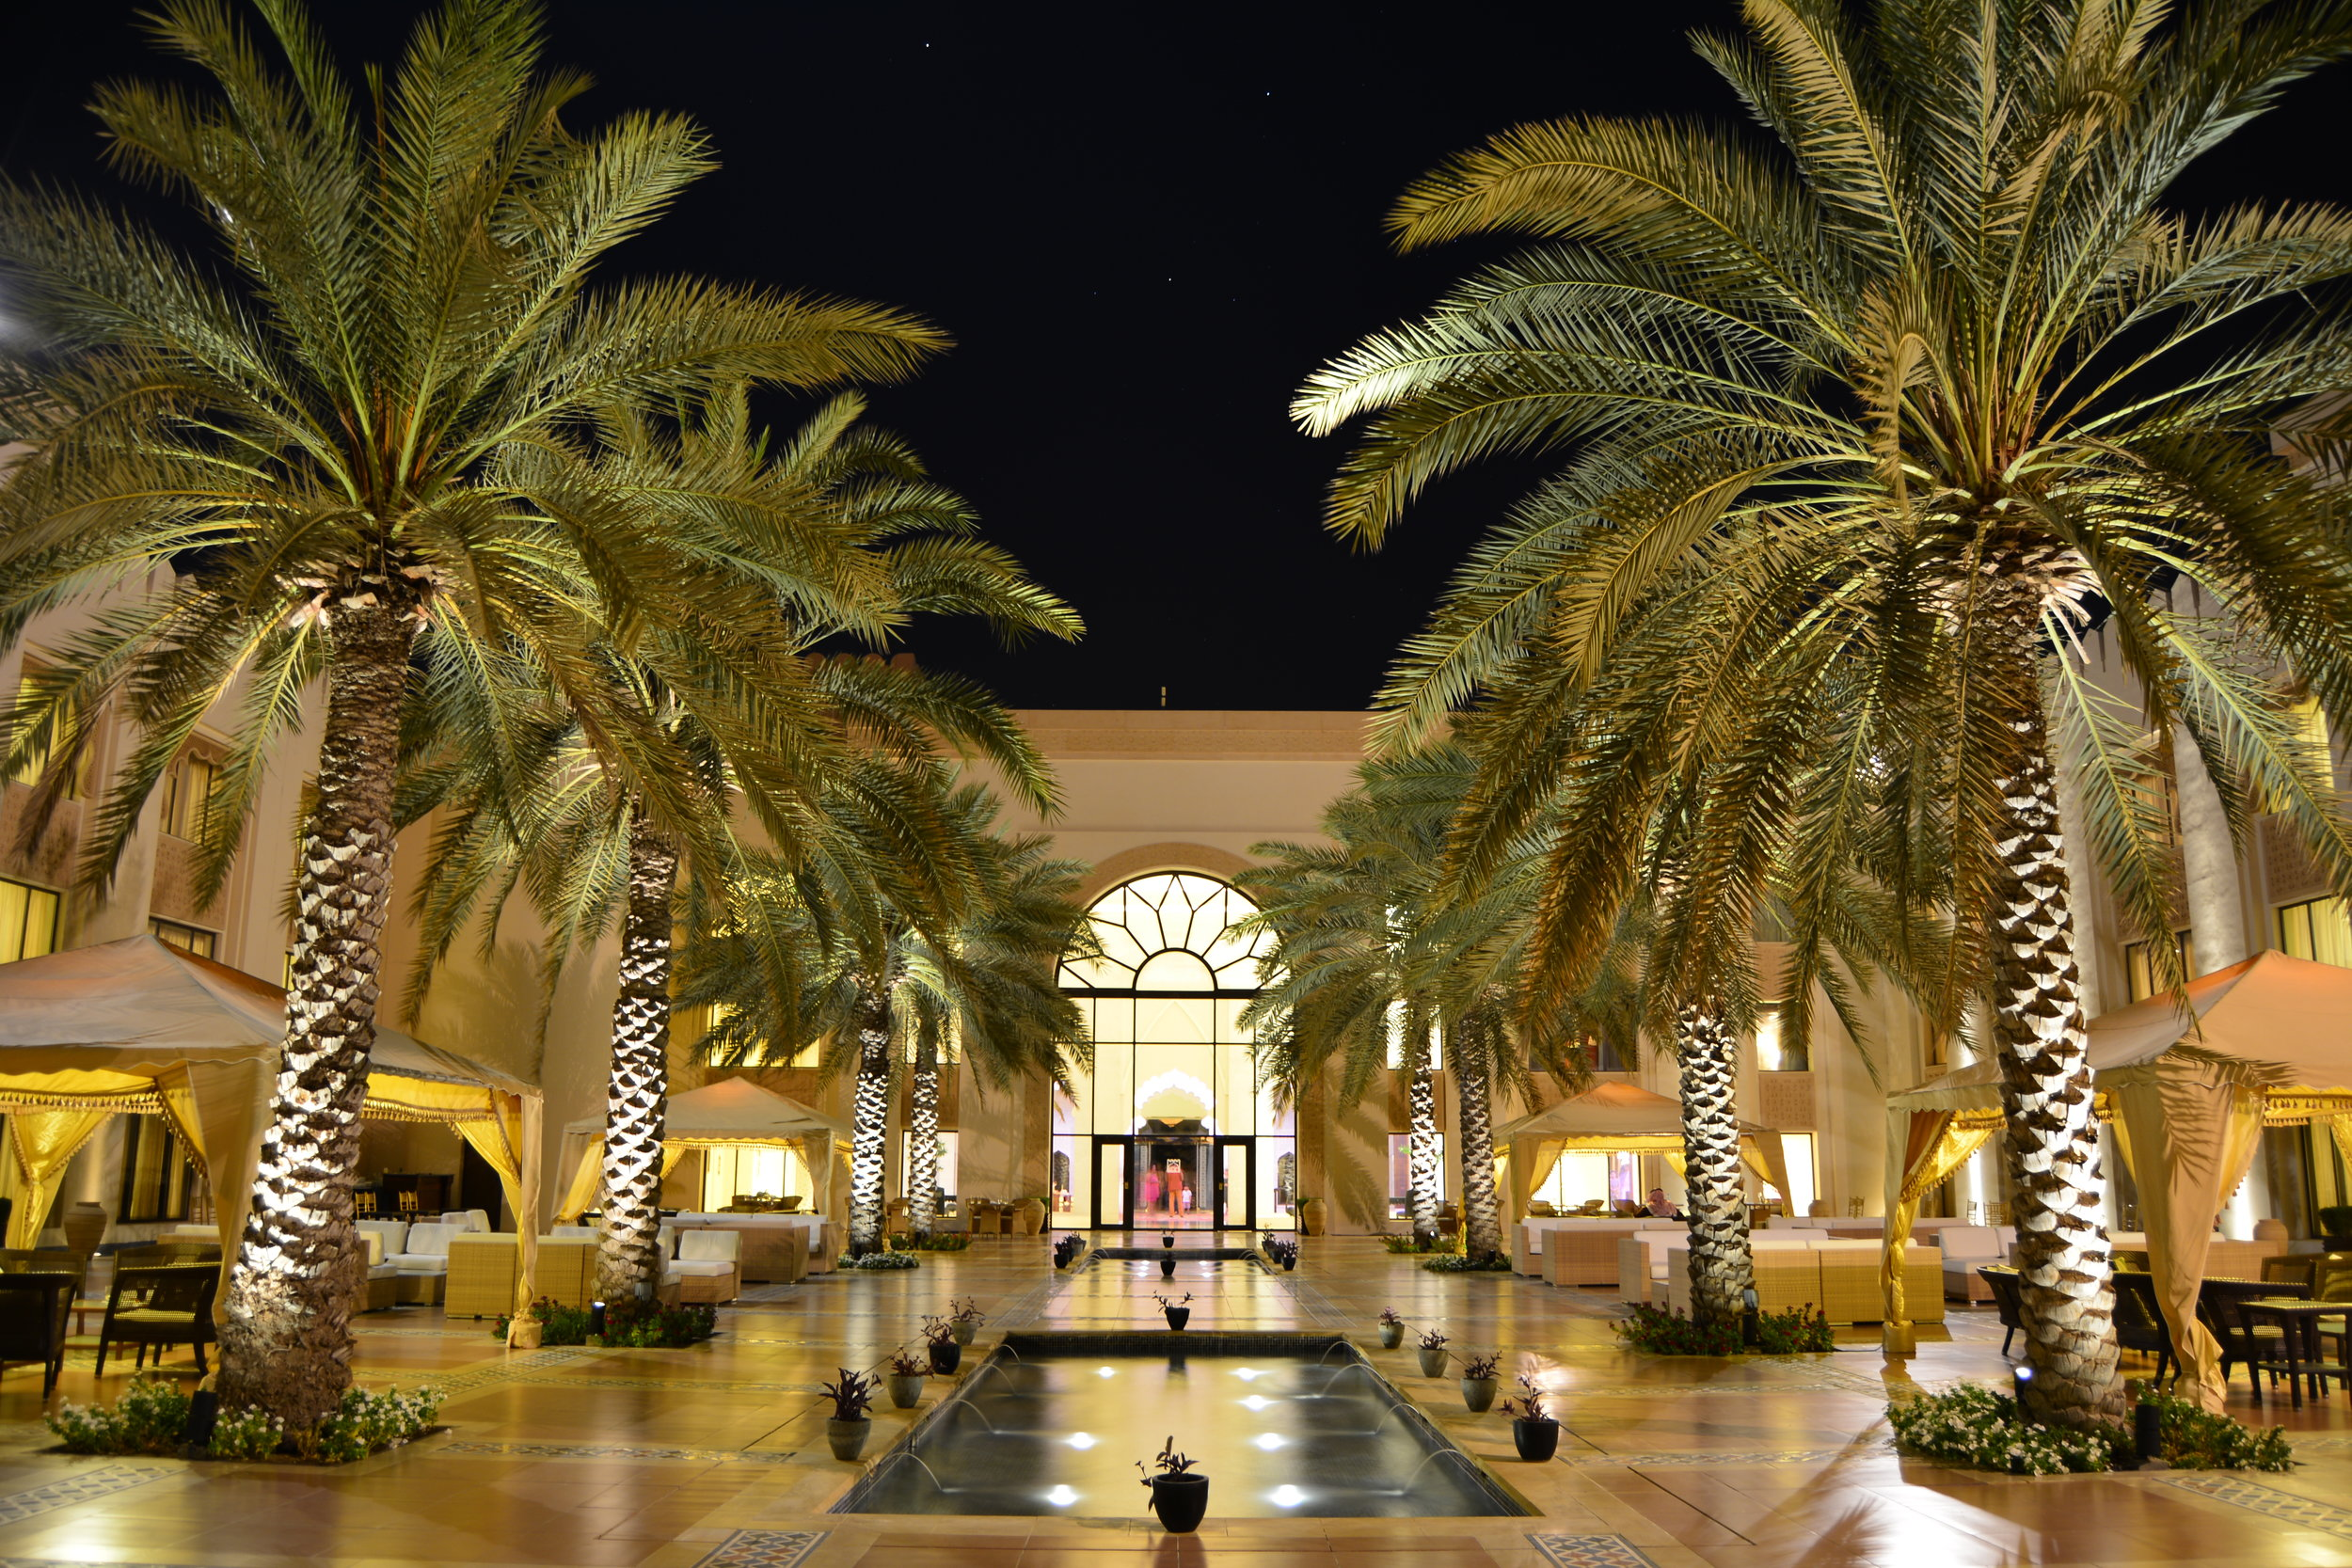 Al Husn - Courtyard at Night